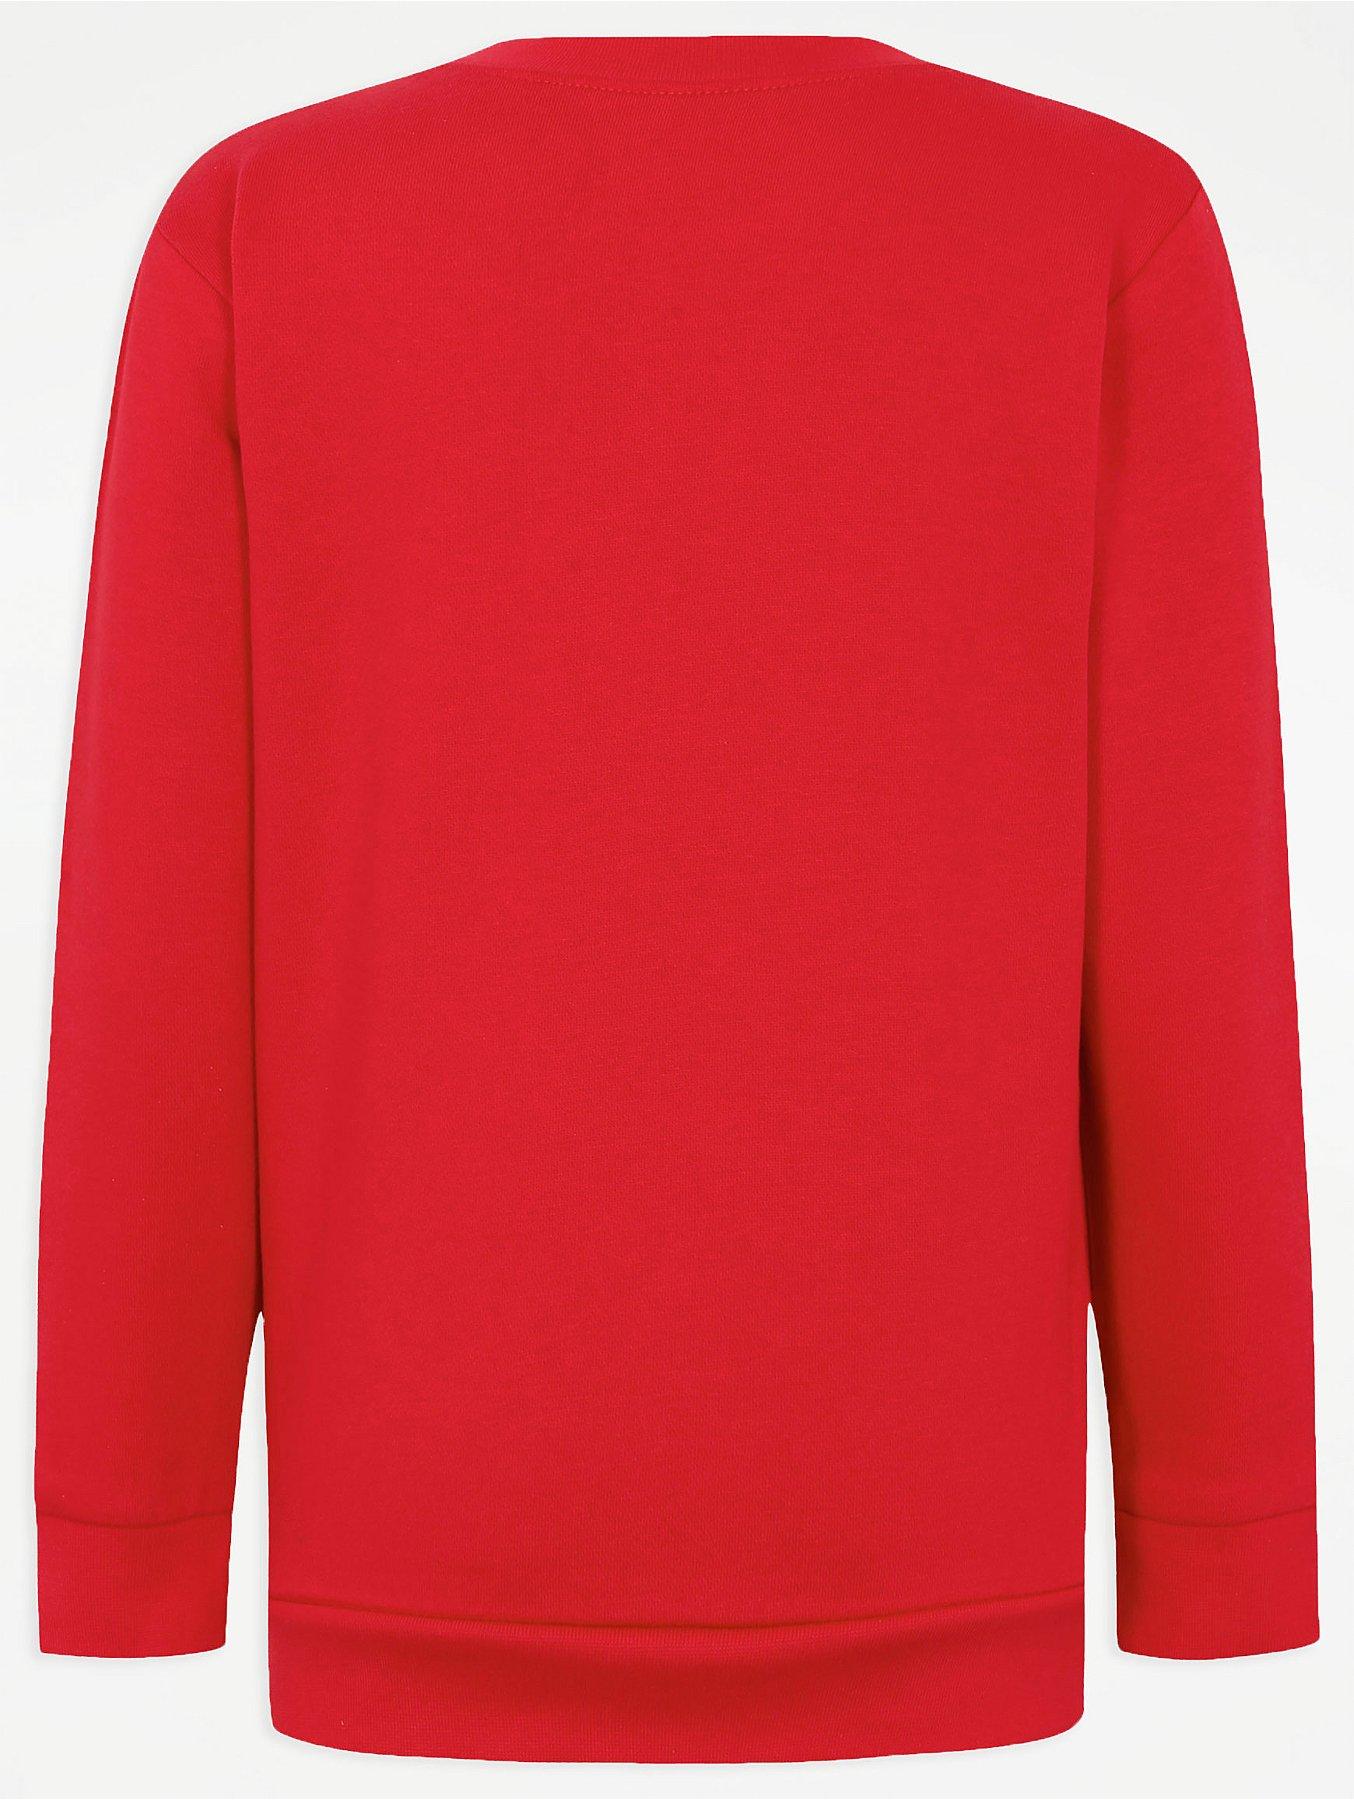 Red School Sweatshirt 2 Pack